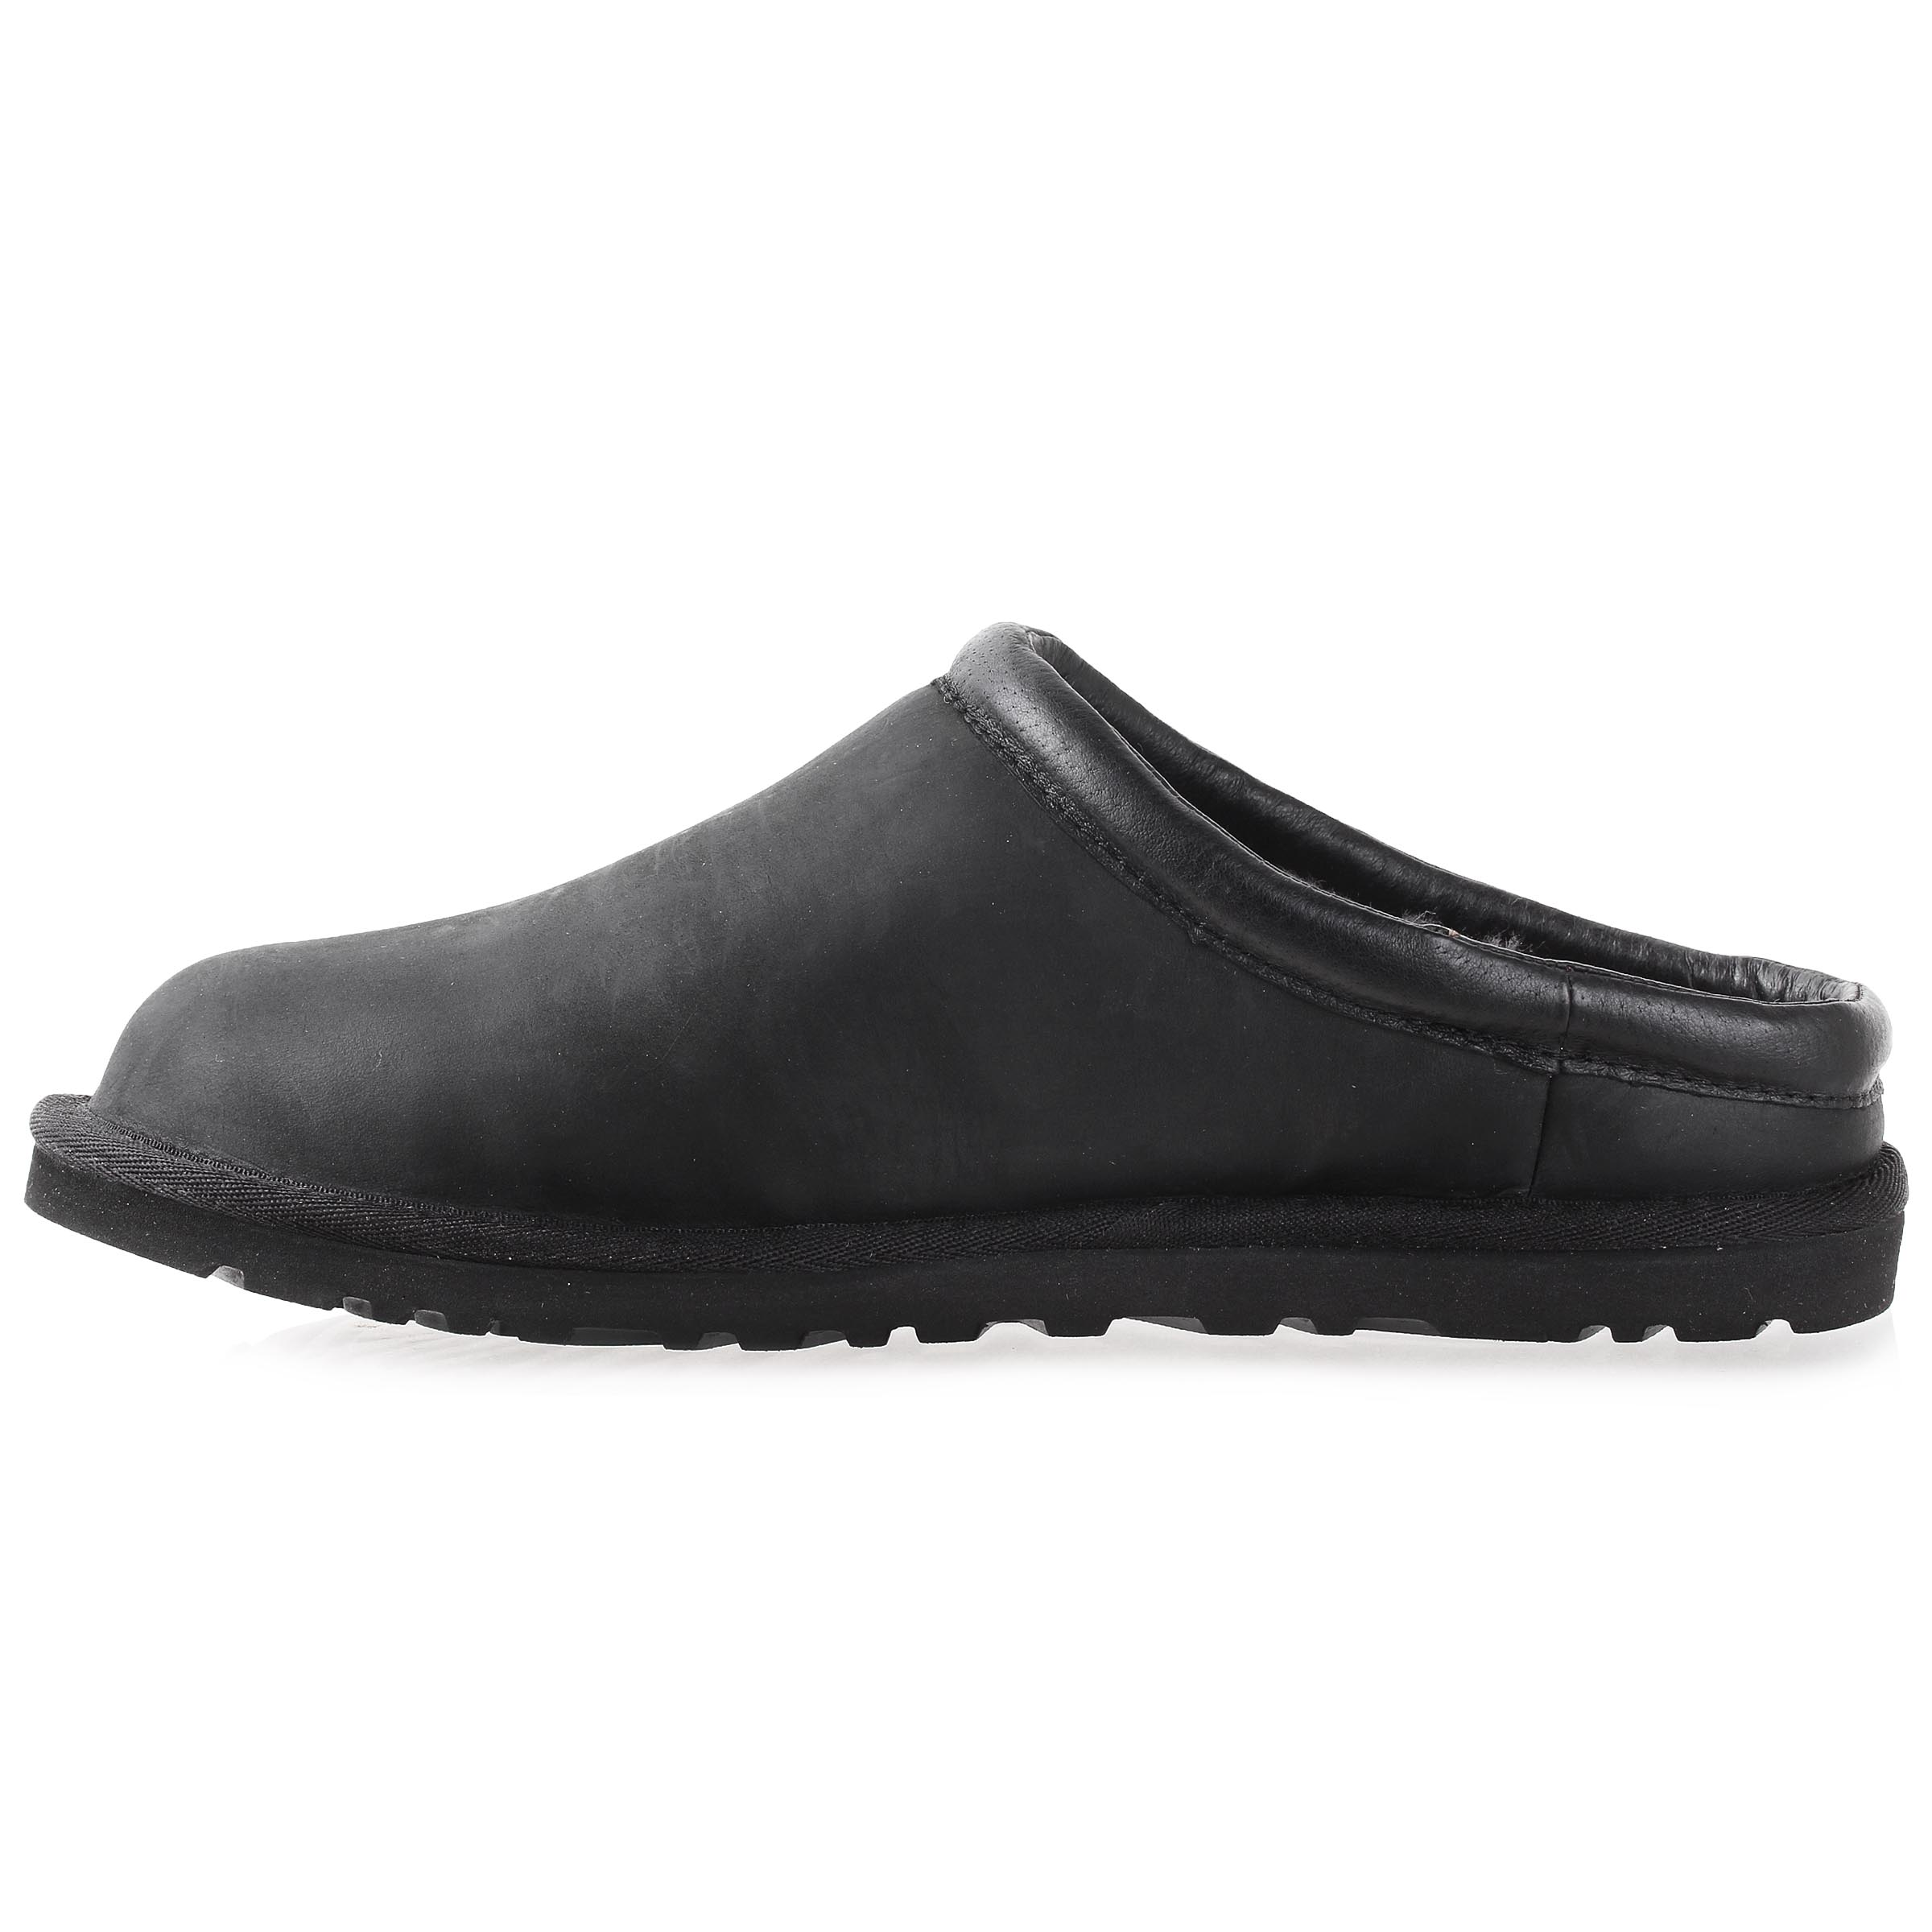 e1ec9248585 Details about UGG Men's Classic Clog Slipper shoes 1011413 Black